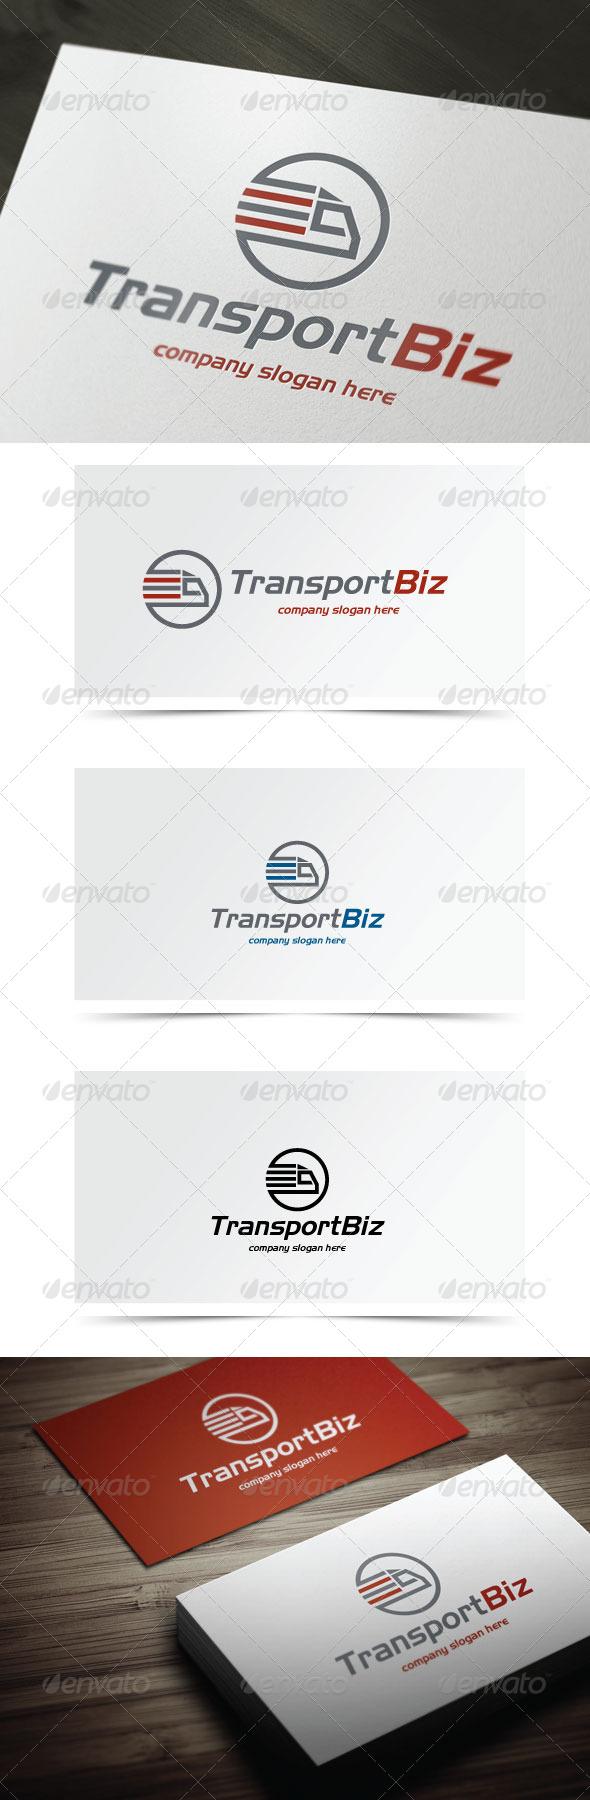 Transport Biz - Objects Logo Templates